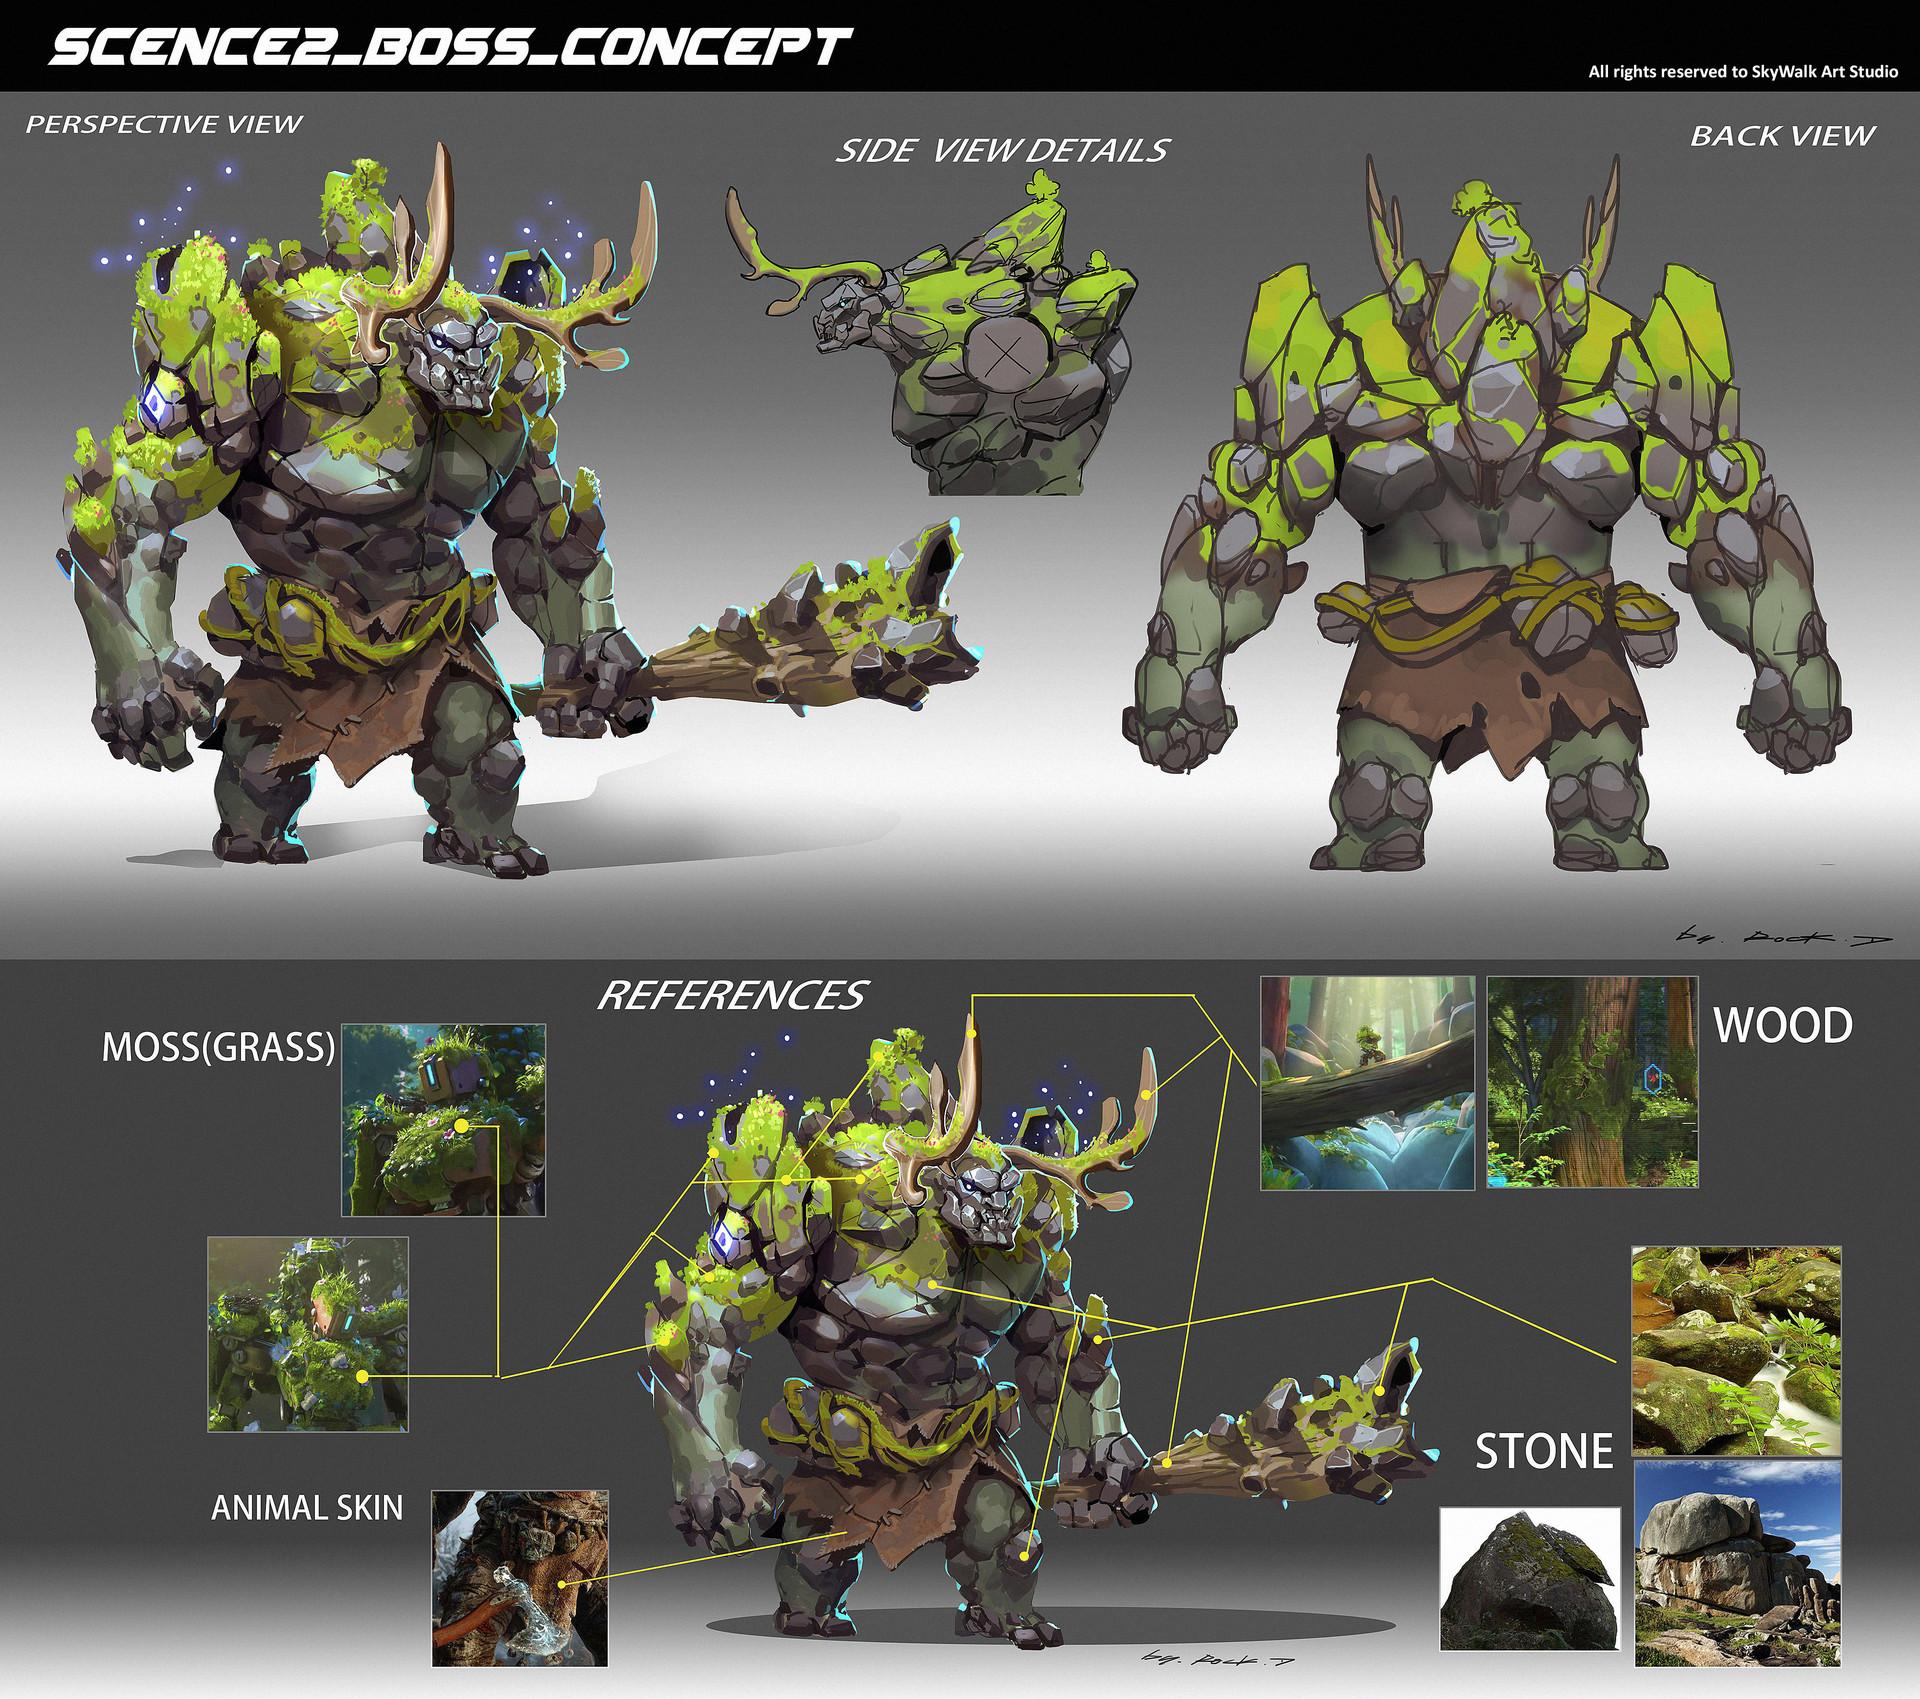 Rock d scence2 boss concept